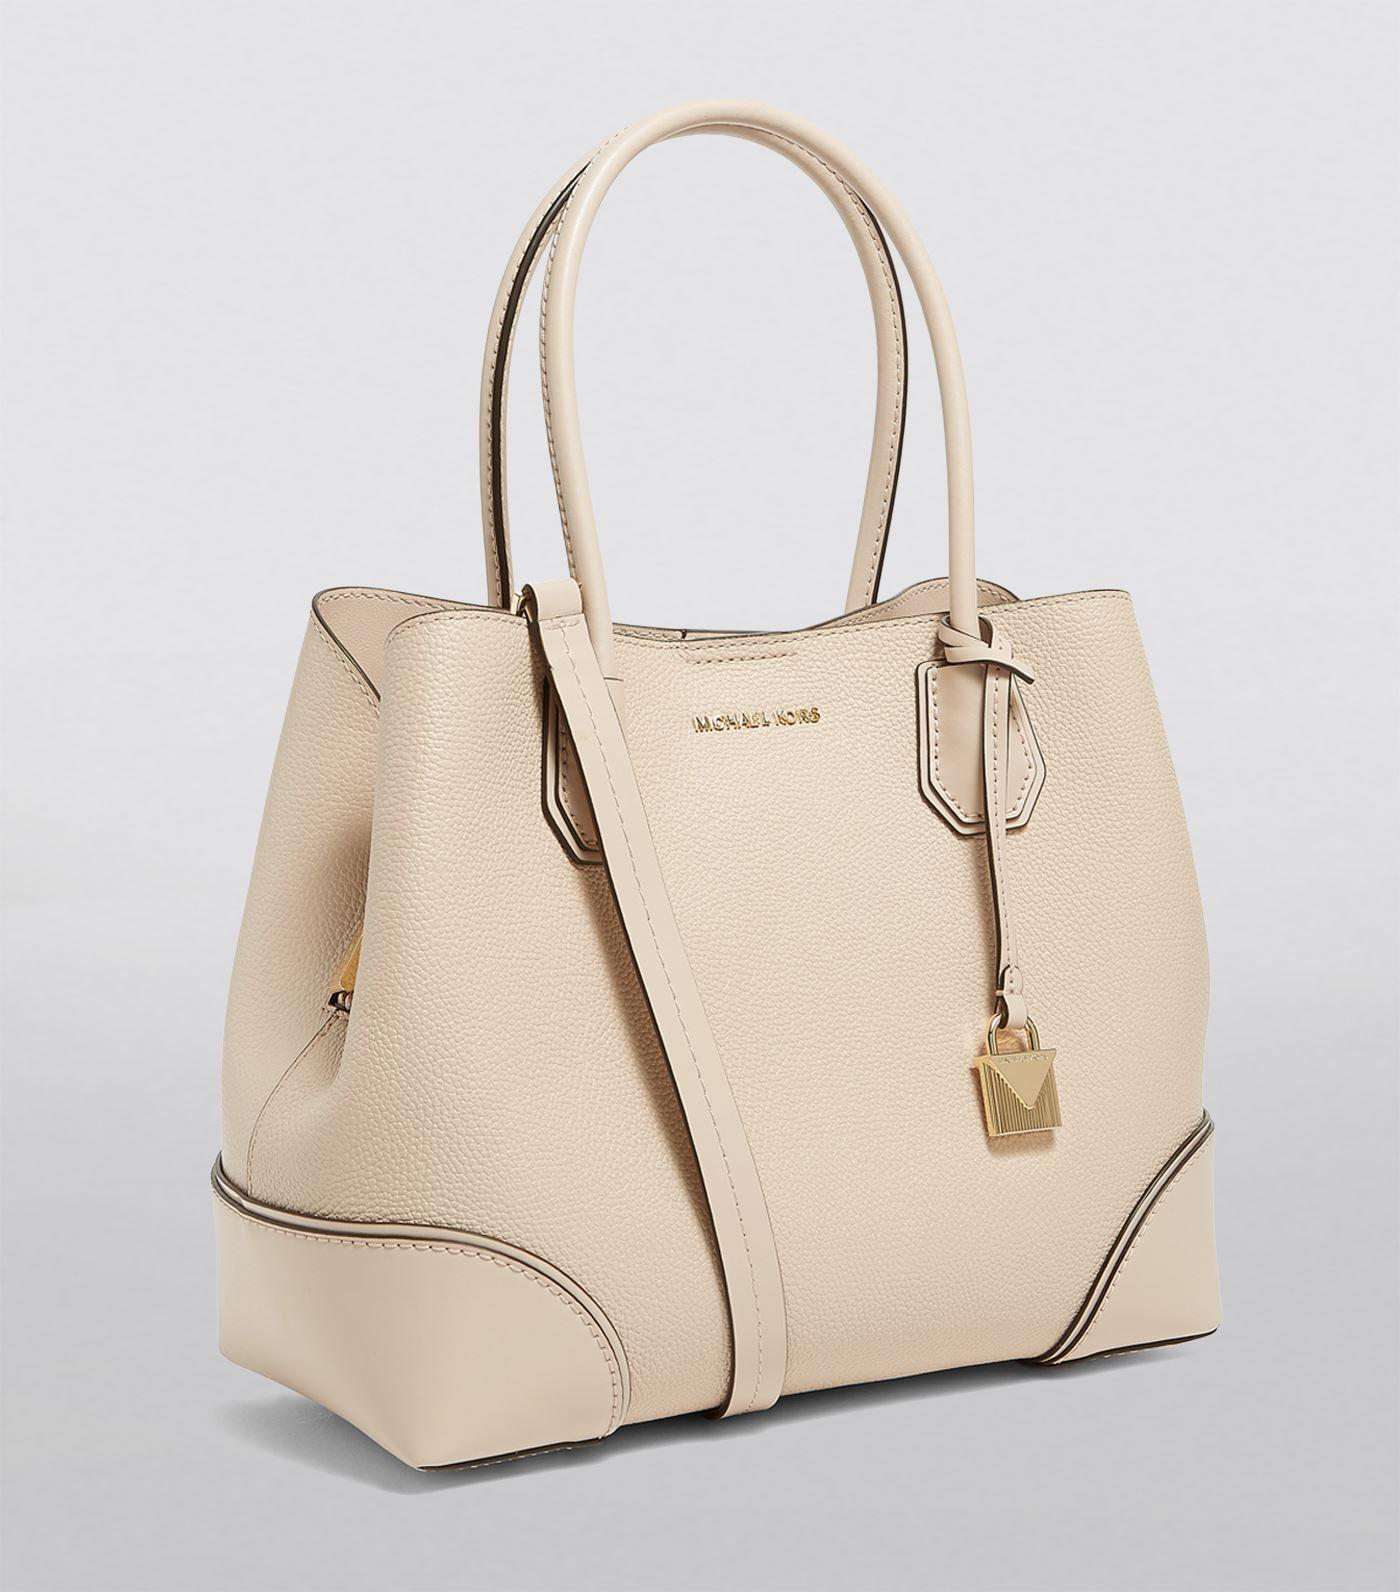 8519ce22d888 Michael Michael Kors Medium Leather Mercer Gallery Bag #AD , #sponsored,  #Medium, #Kors, #Michael, #Leather, #Bag